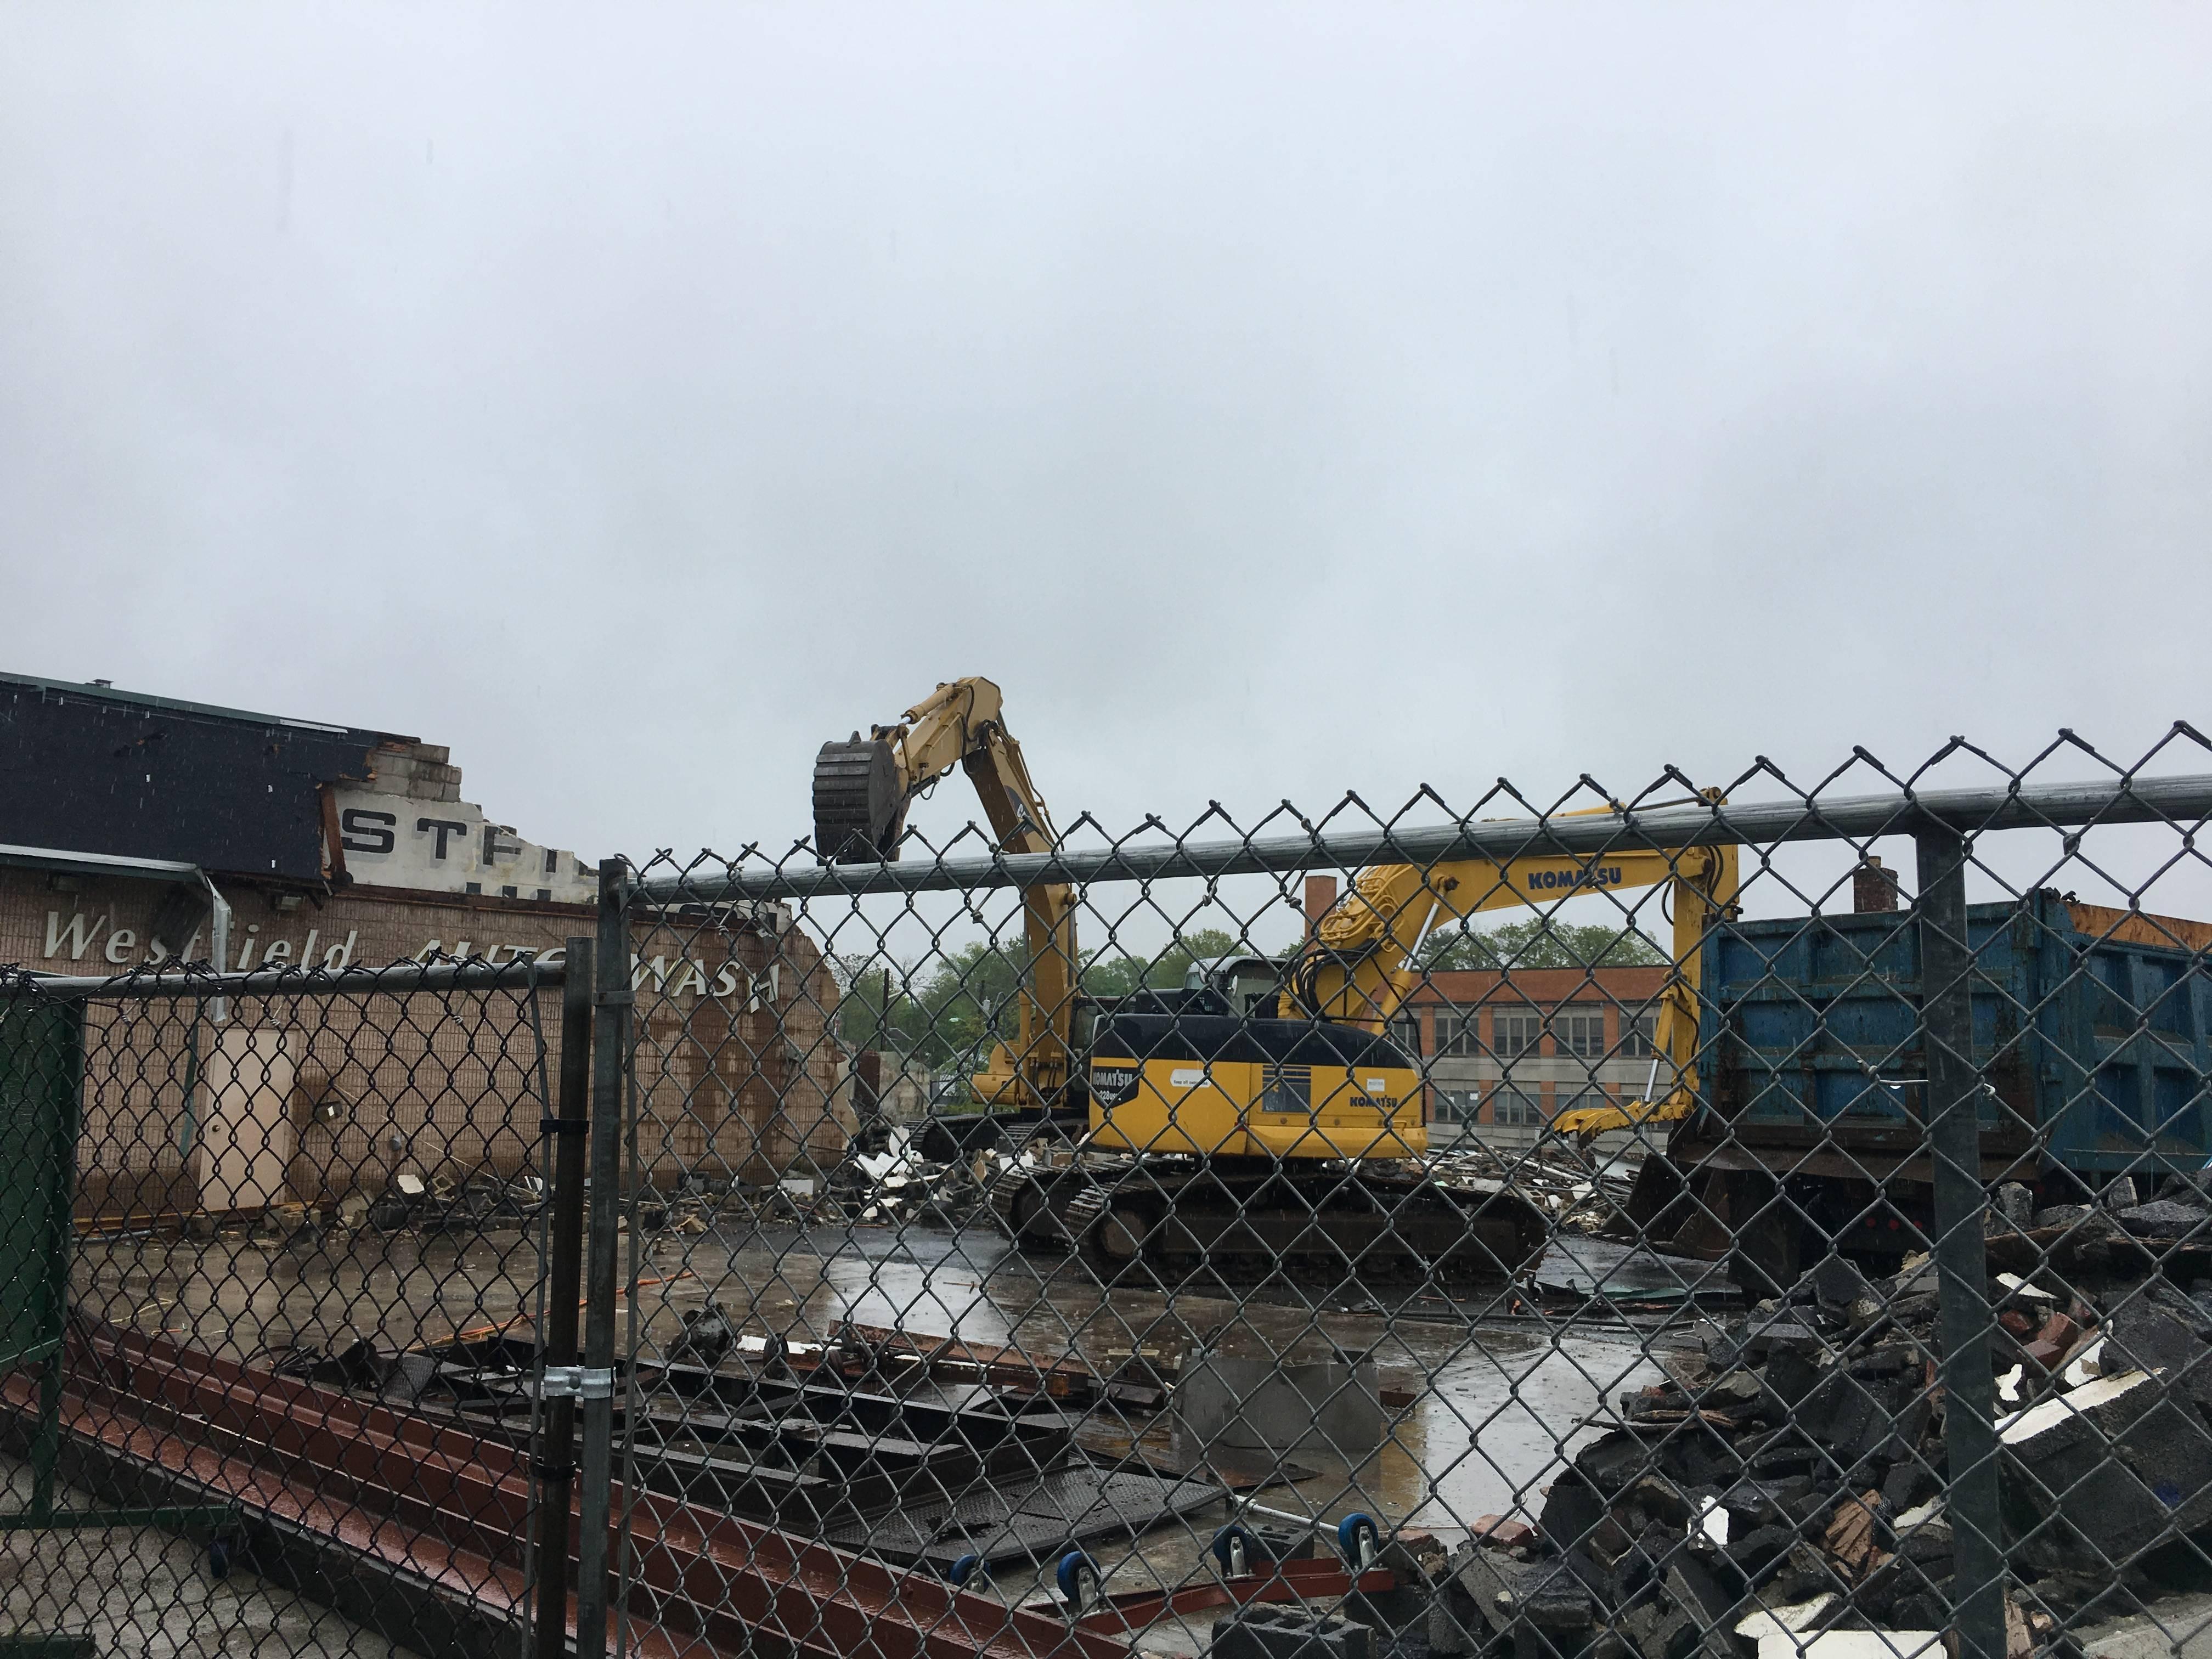 Westfield Auto Wash Demolished to Construct New Apartment plex